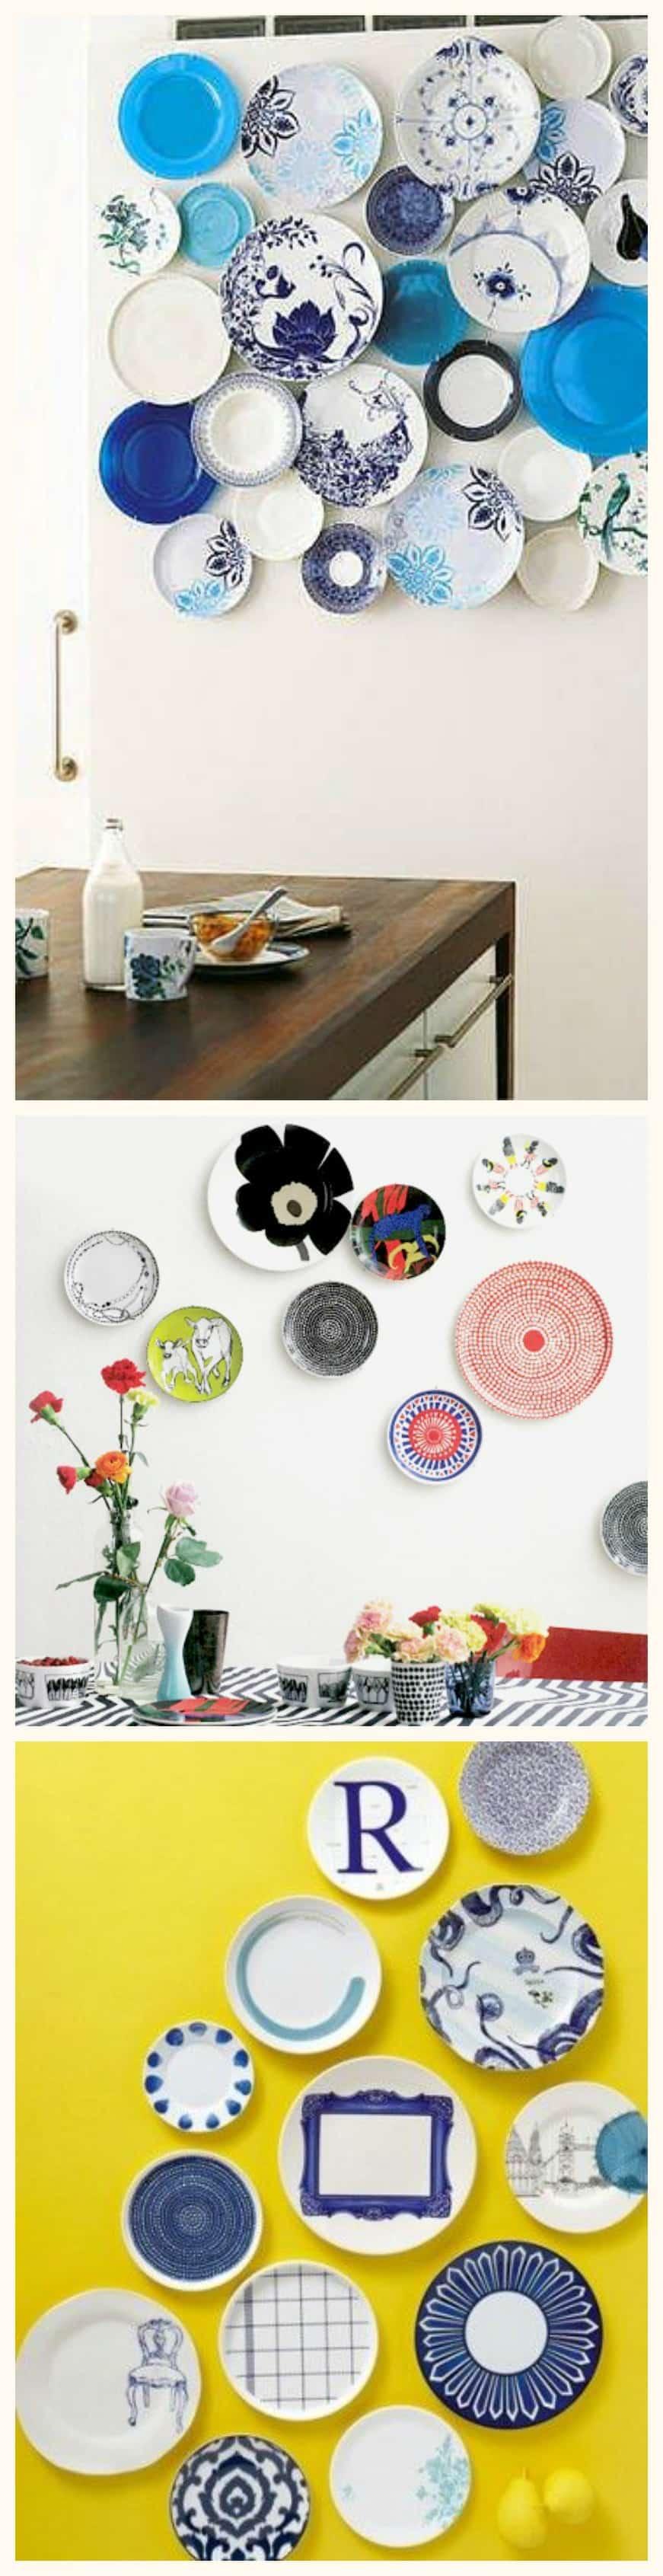 Diy 10 idee su come decorare una parete di casa - Piatti da cucina moderni ...